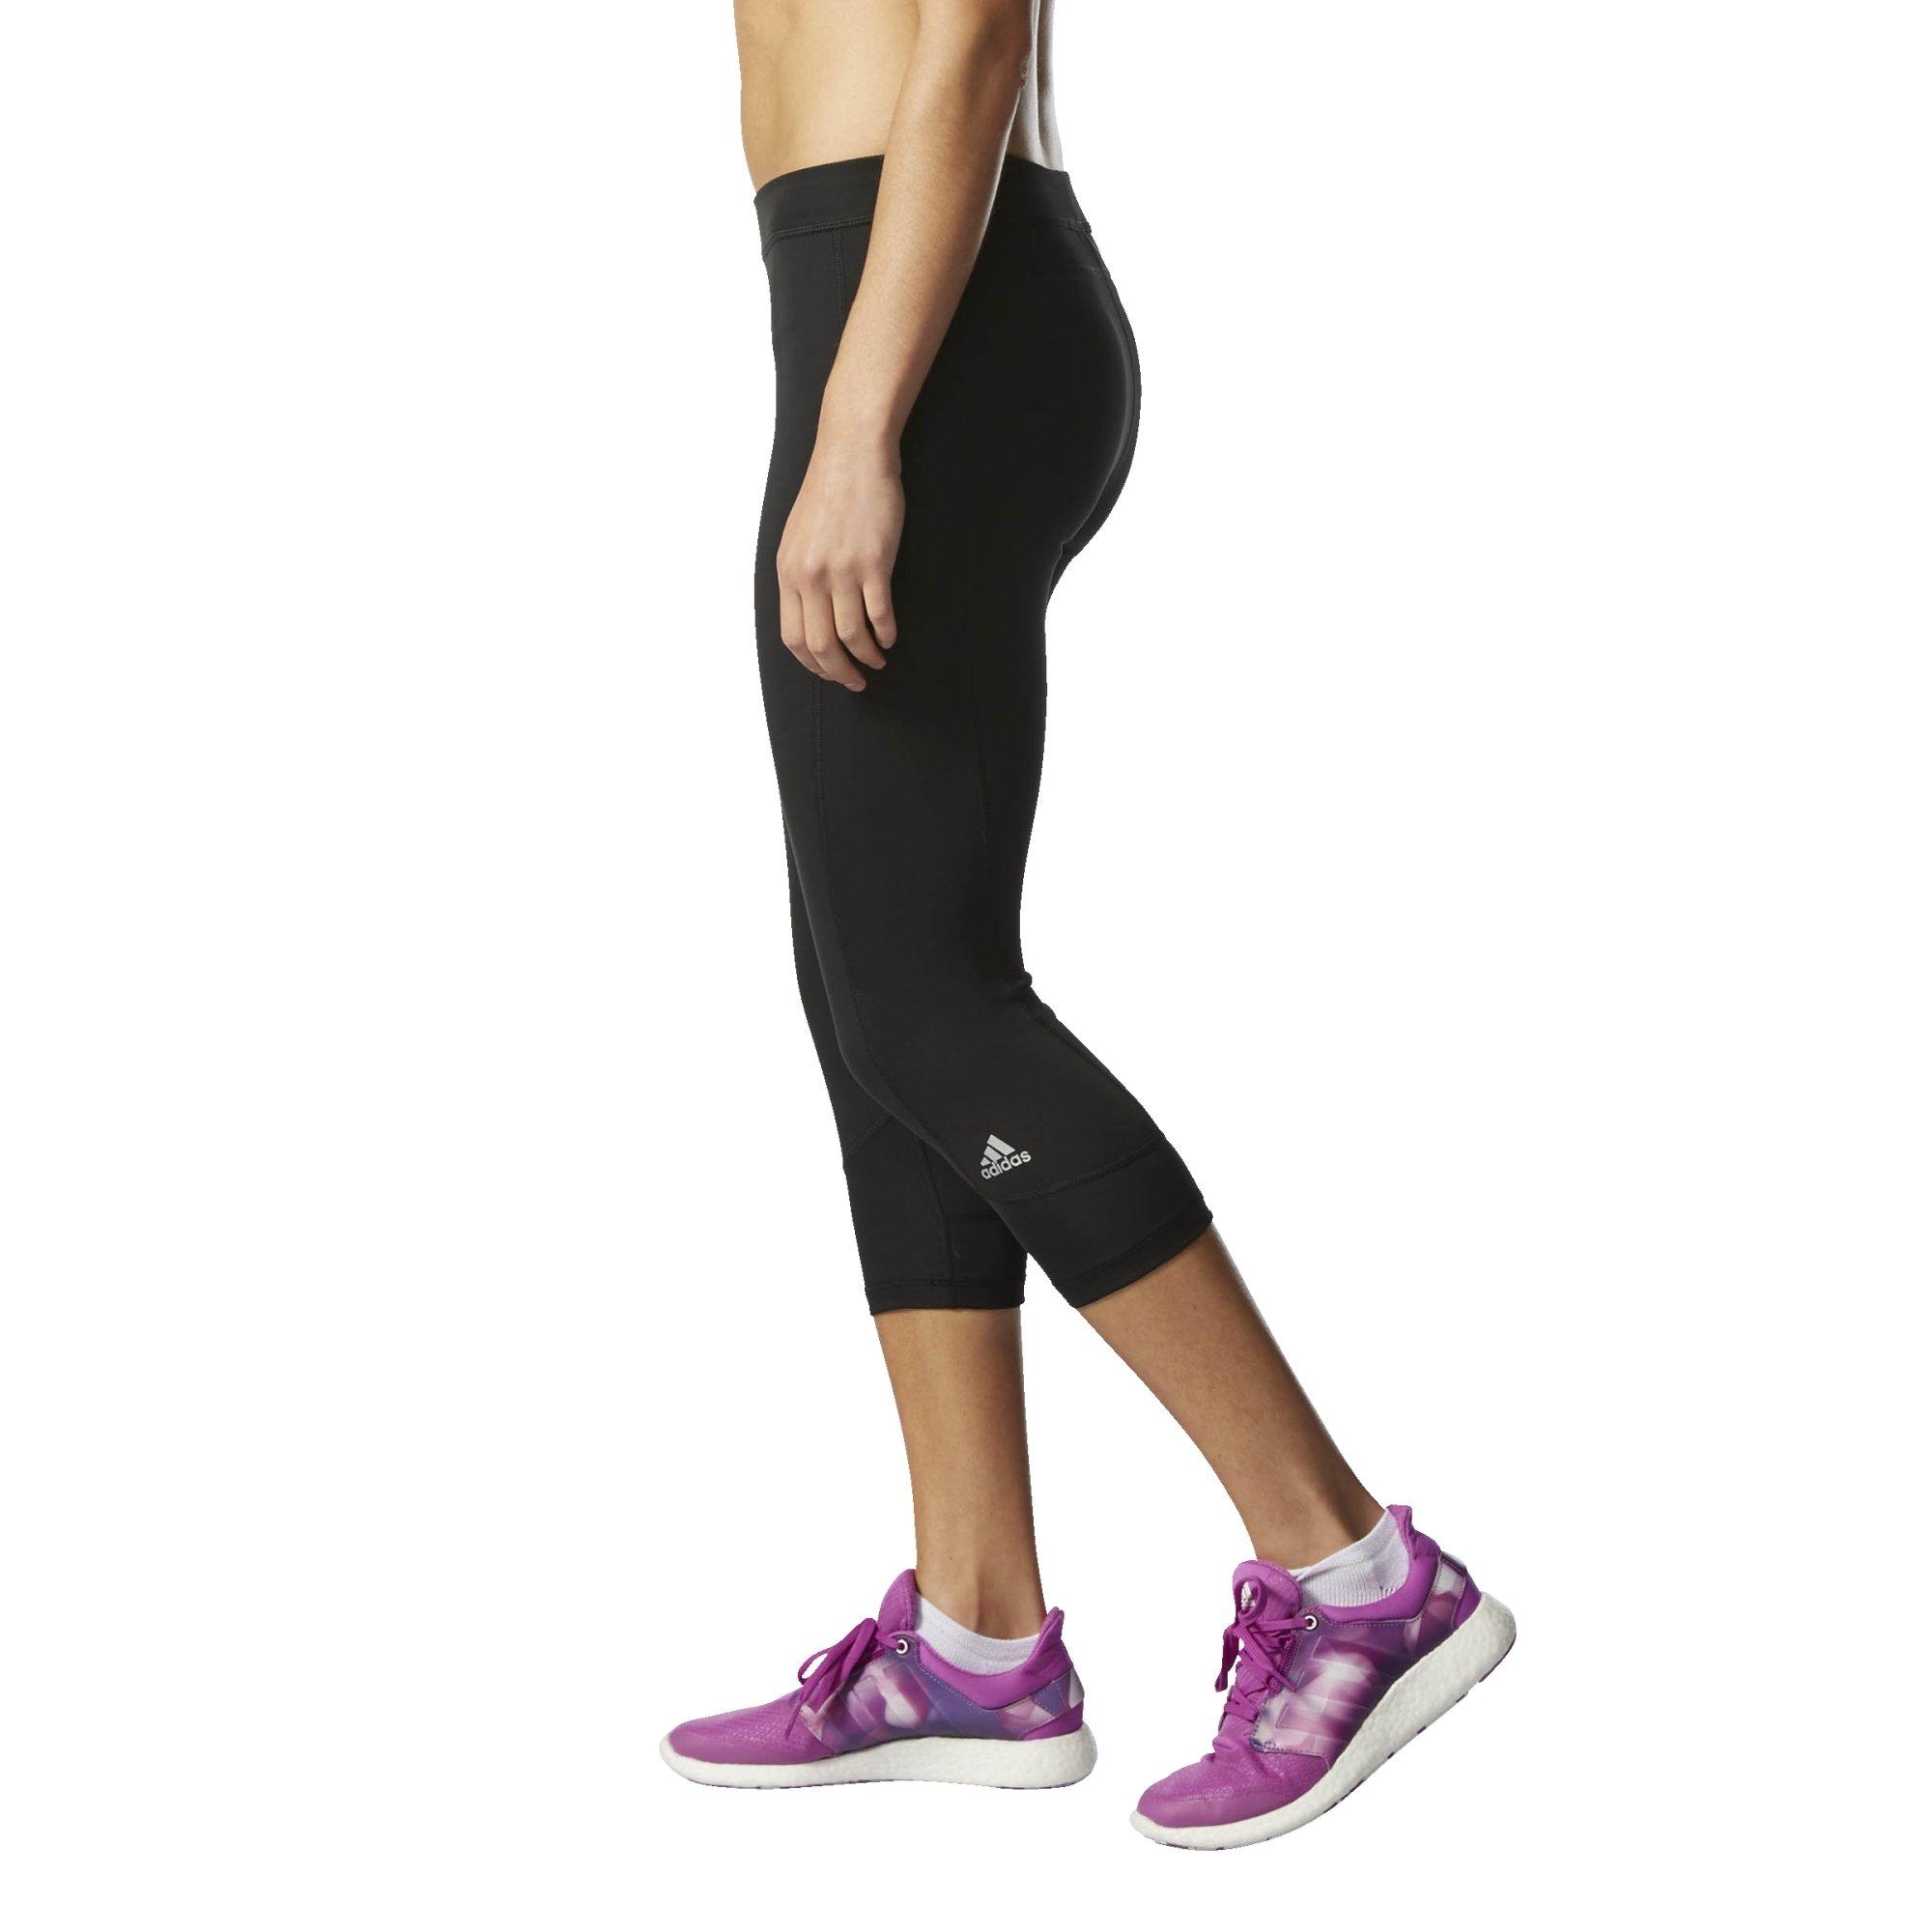 adidas Women's Techfit Capris, Black/Matte Silver, X-Small